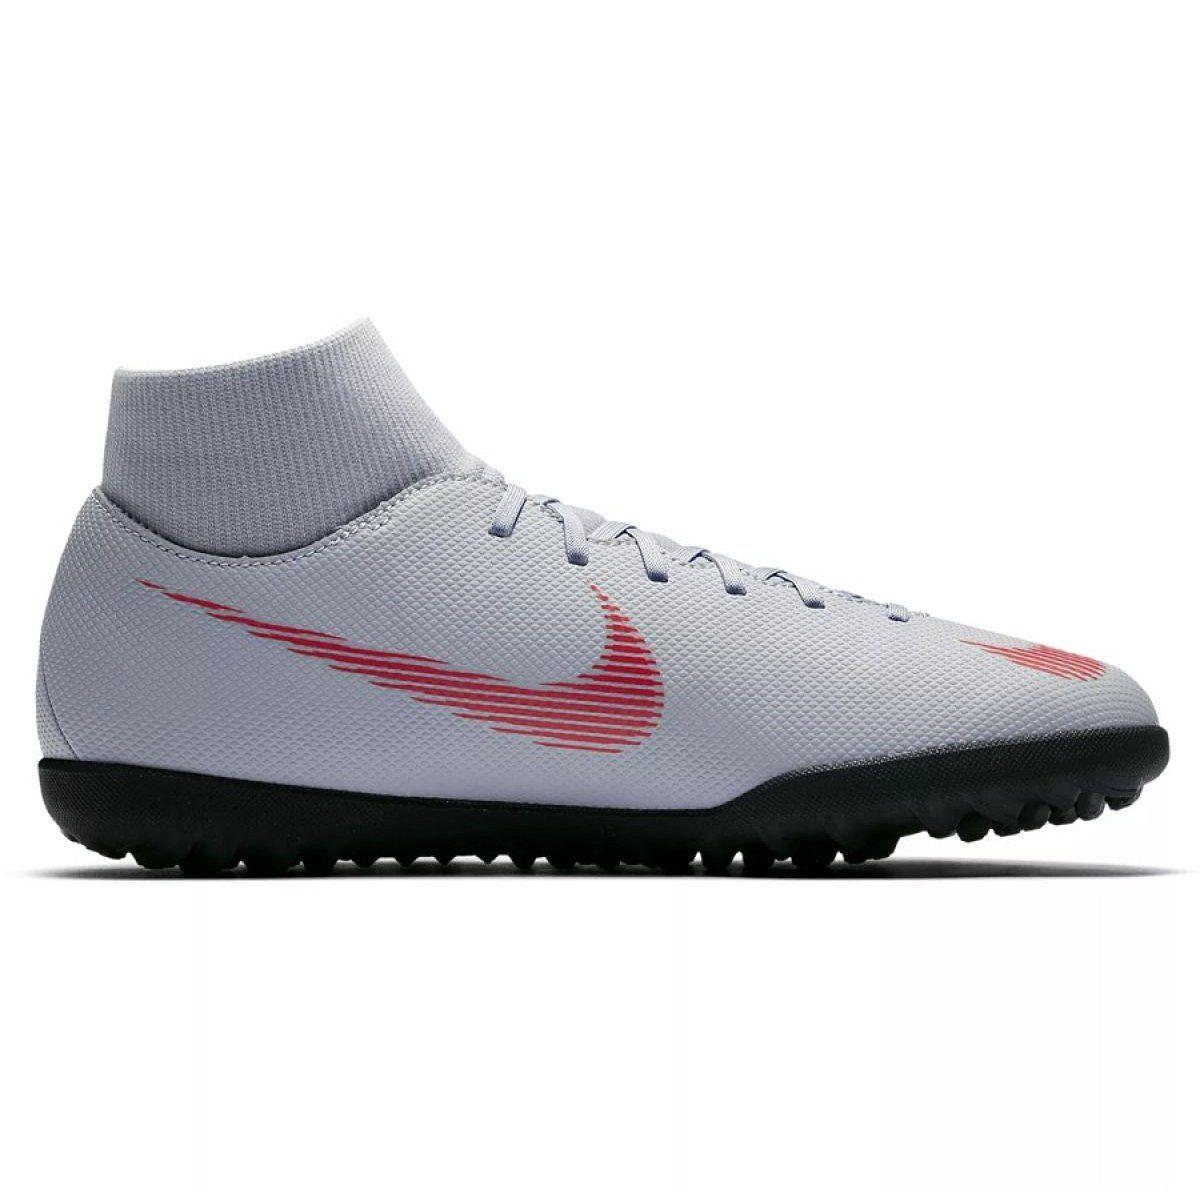 Nike Mercurial Superflyx 6 Club Tf M Ah7372 060 Football Shoes Grey Grey Football Shoes Nike Football Boots